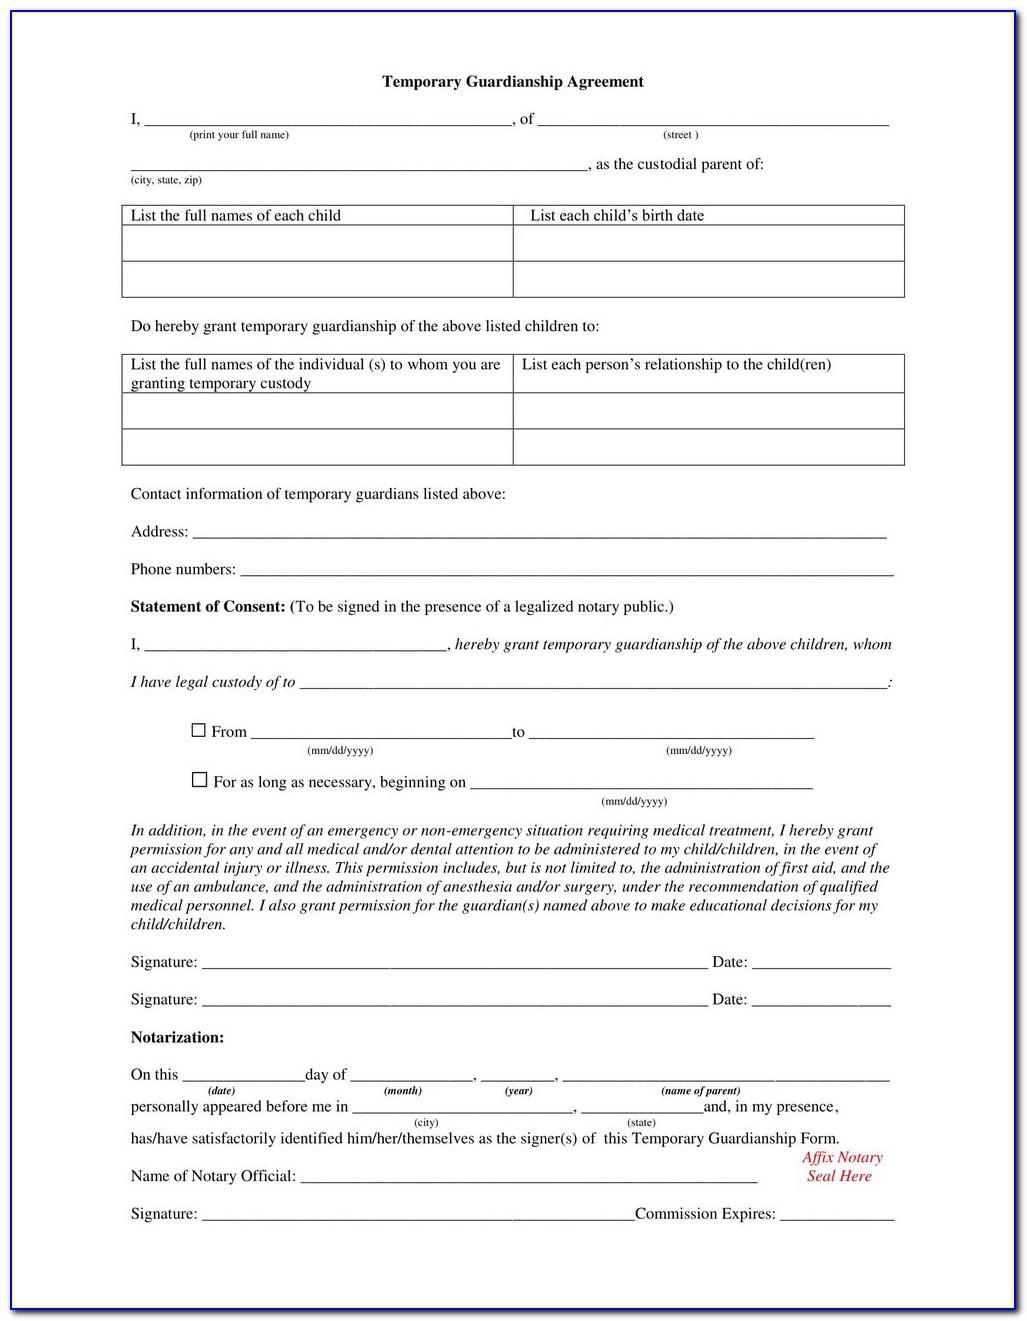 Arizona Superior Court Guardianship Forms